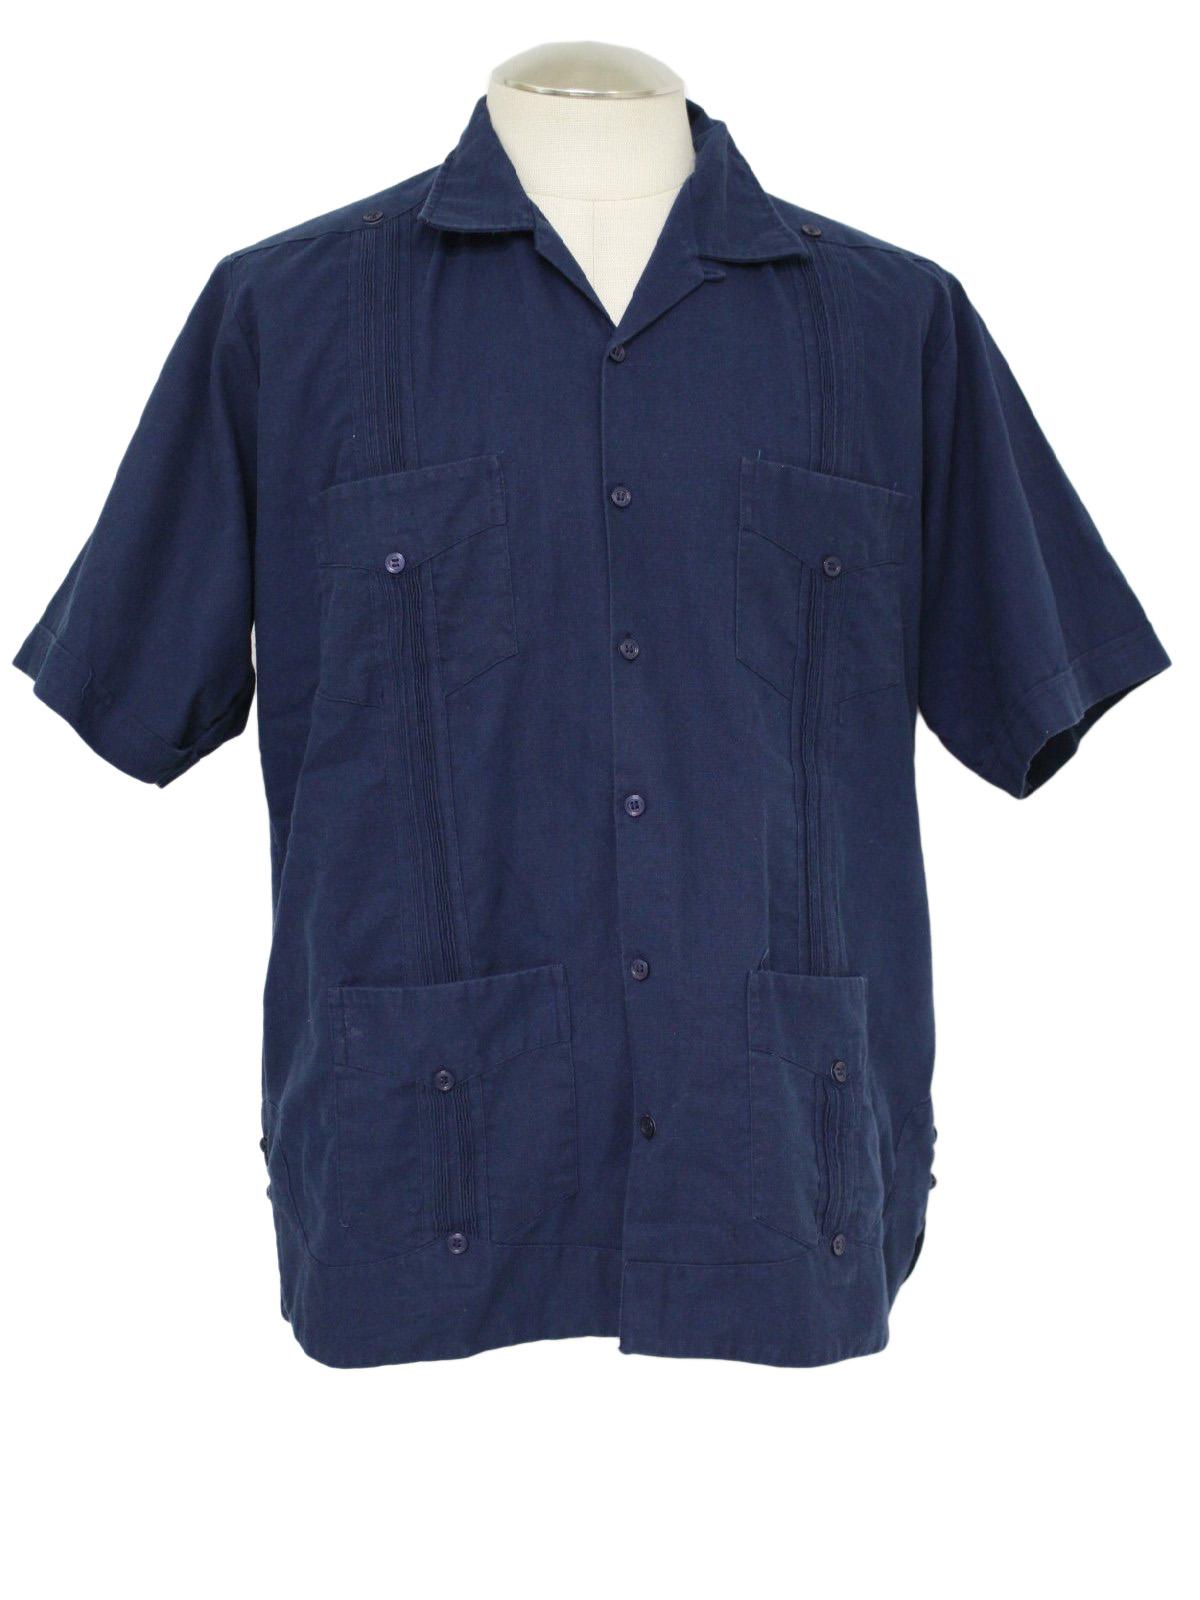 4267dca8c38ab Vintage 1980 s Guayabera Shirt  80s -Hacendado- Mens dark blue ...